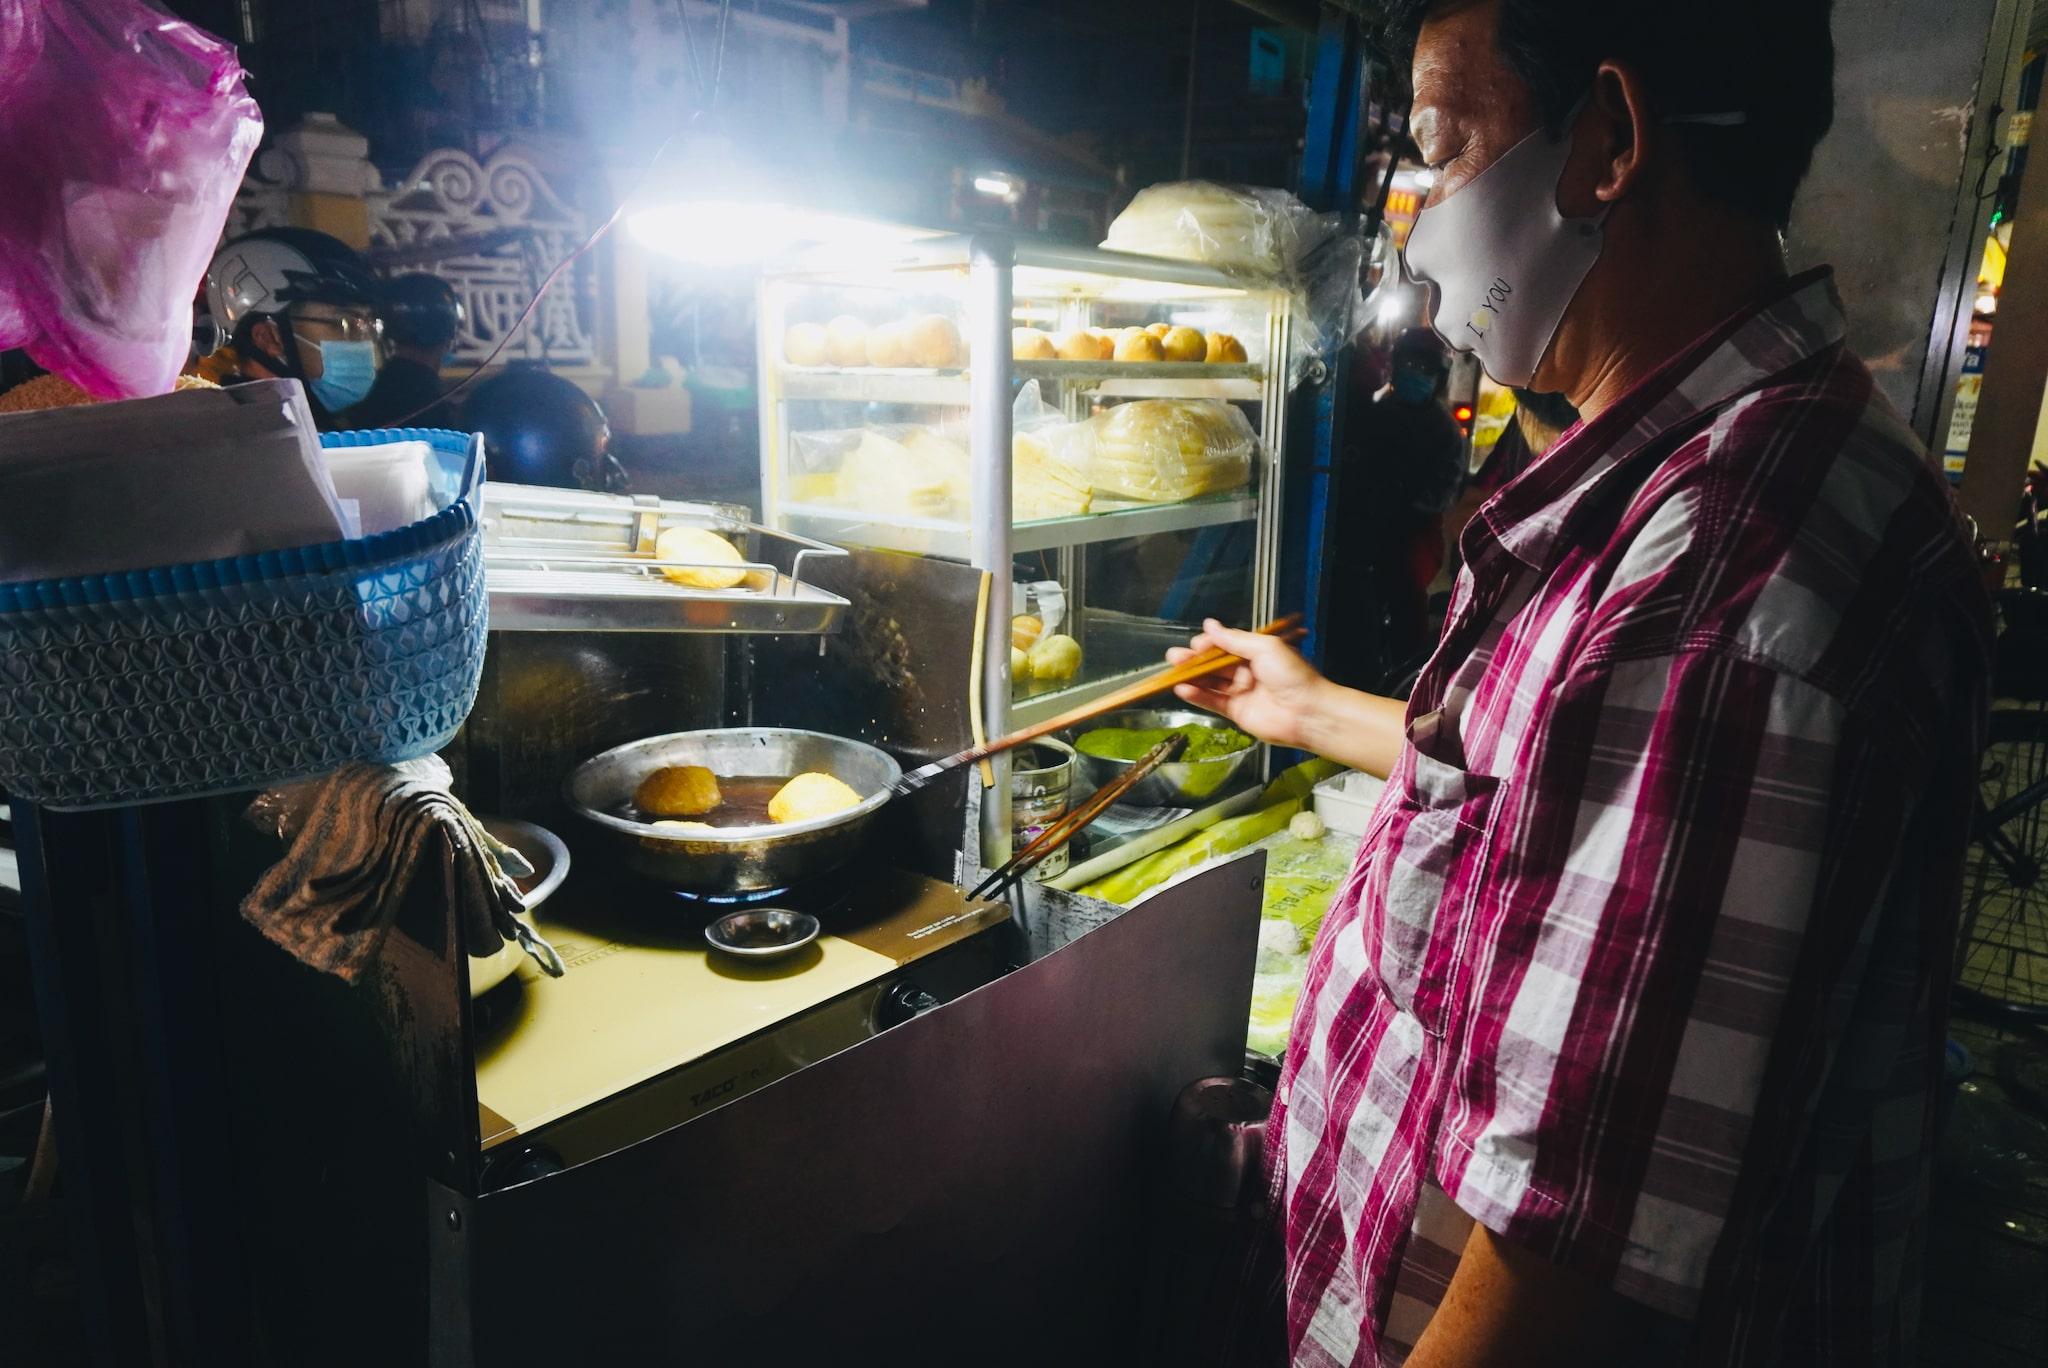 Quang fries banh tieu at a food cart in Long Xuyen City. Photo: Xuan Tung / Tuoi Tre